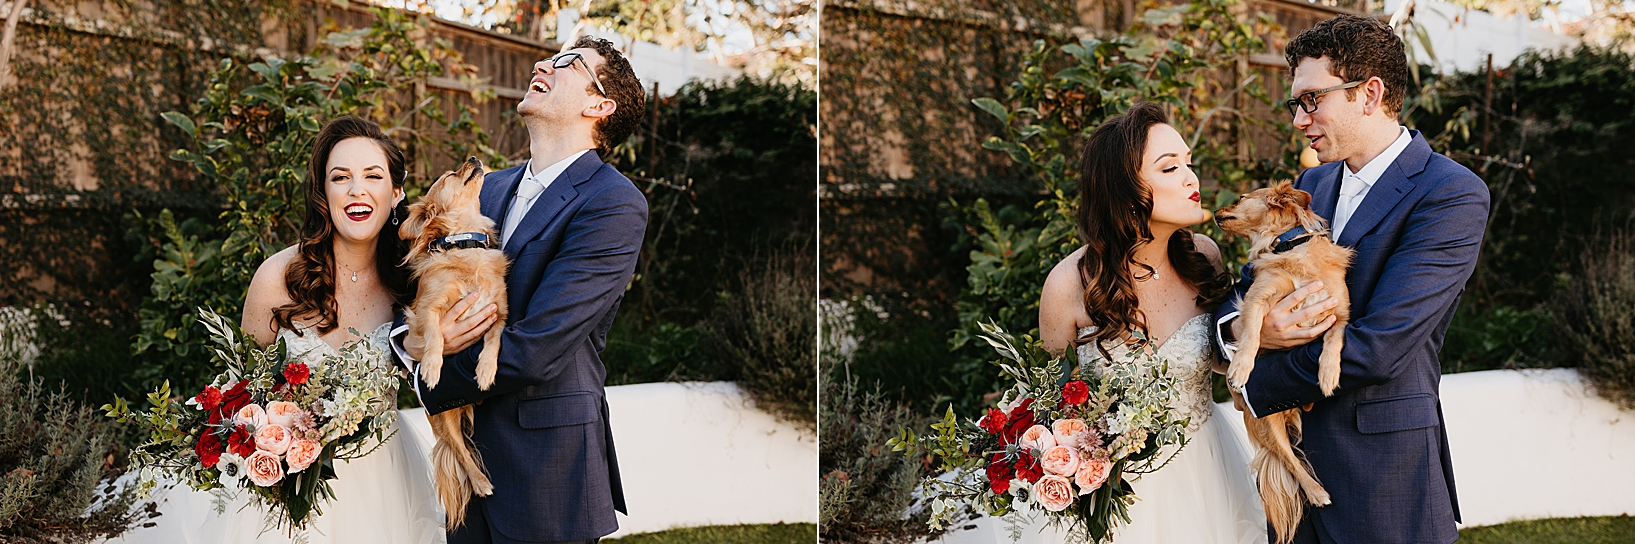 Brick-San-Diego-Winter-Wedding-16-1.jpg